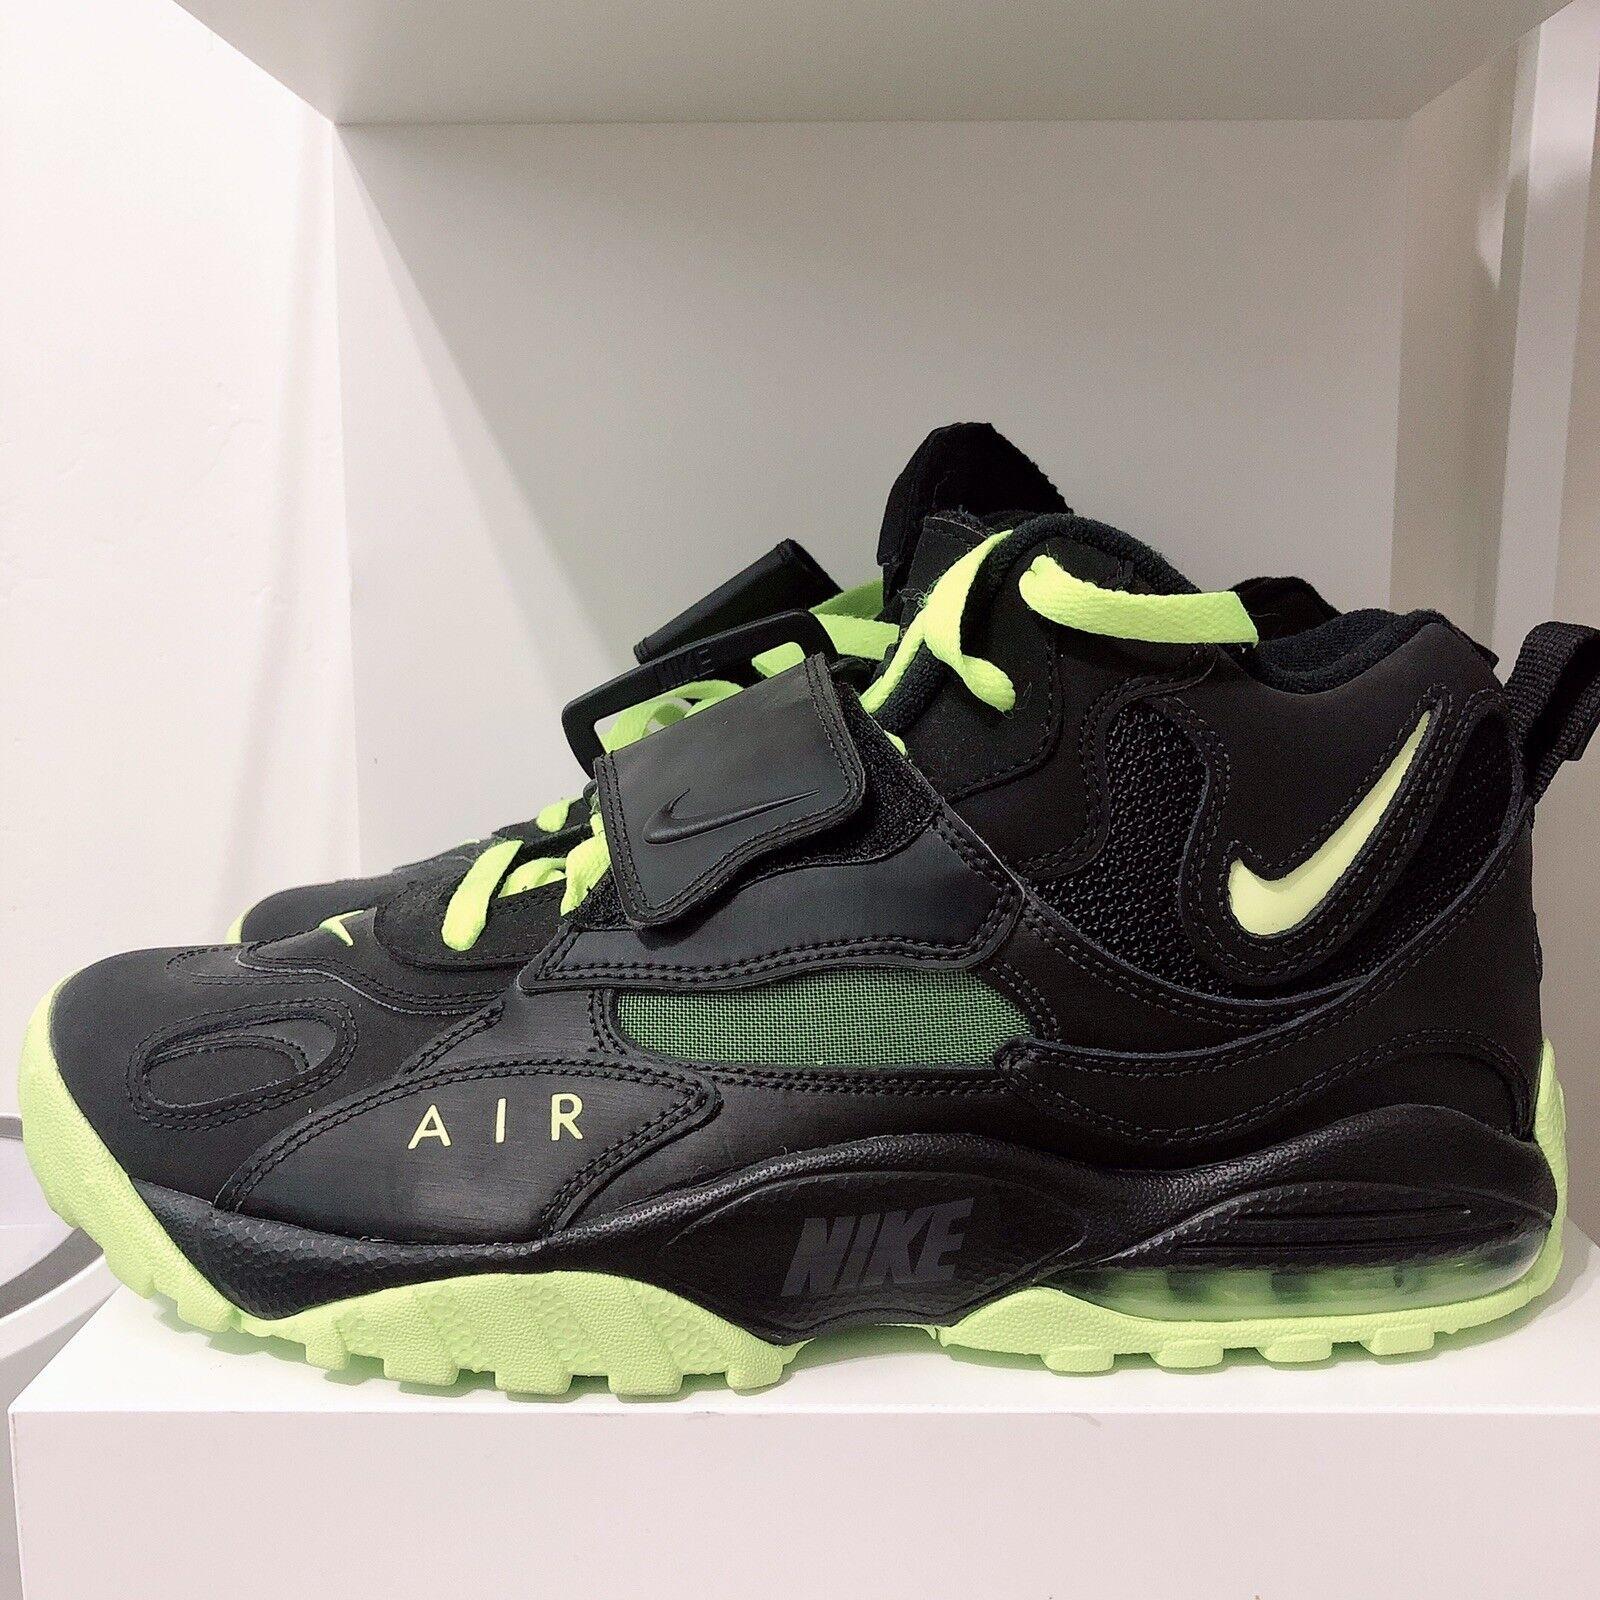 Nike Air Max Turf Sz 10 Black volt Football shoes